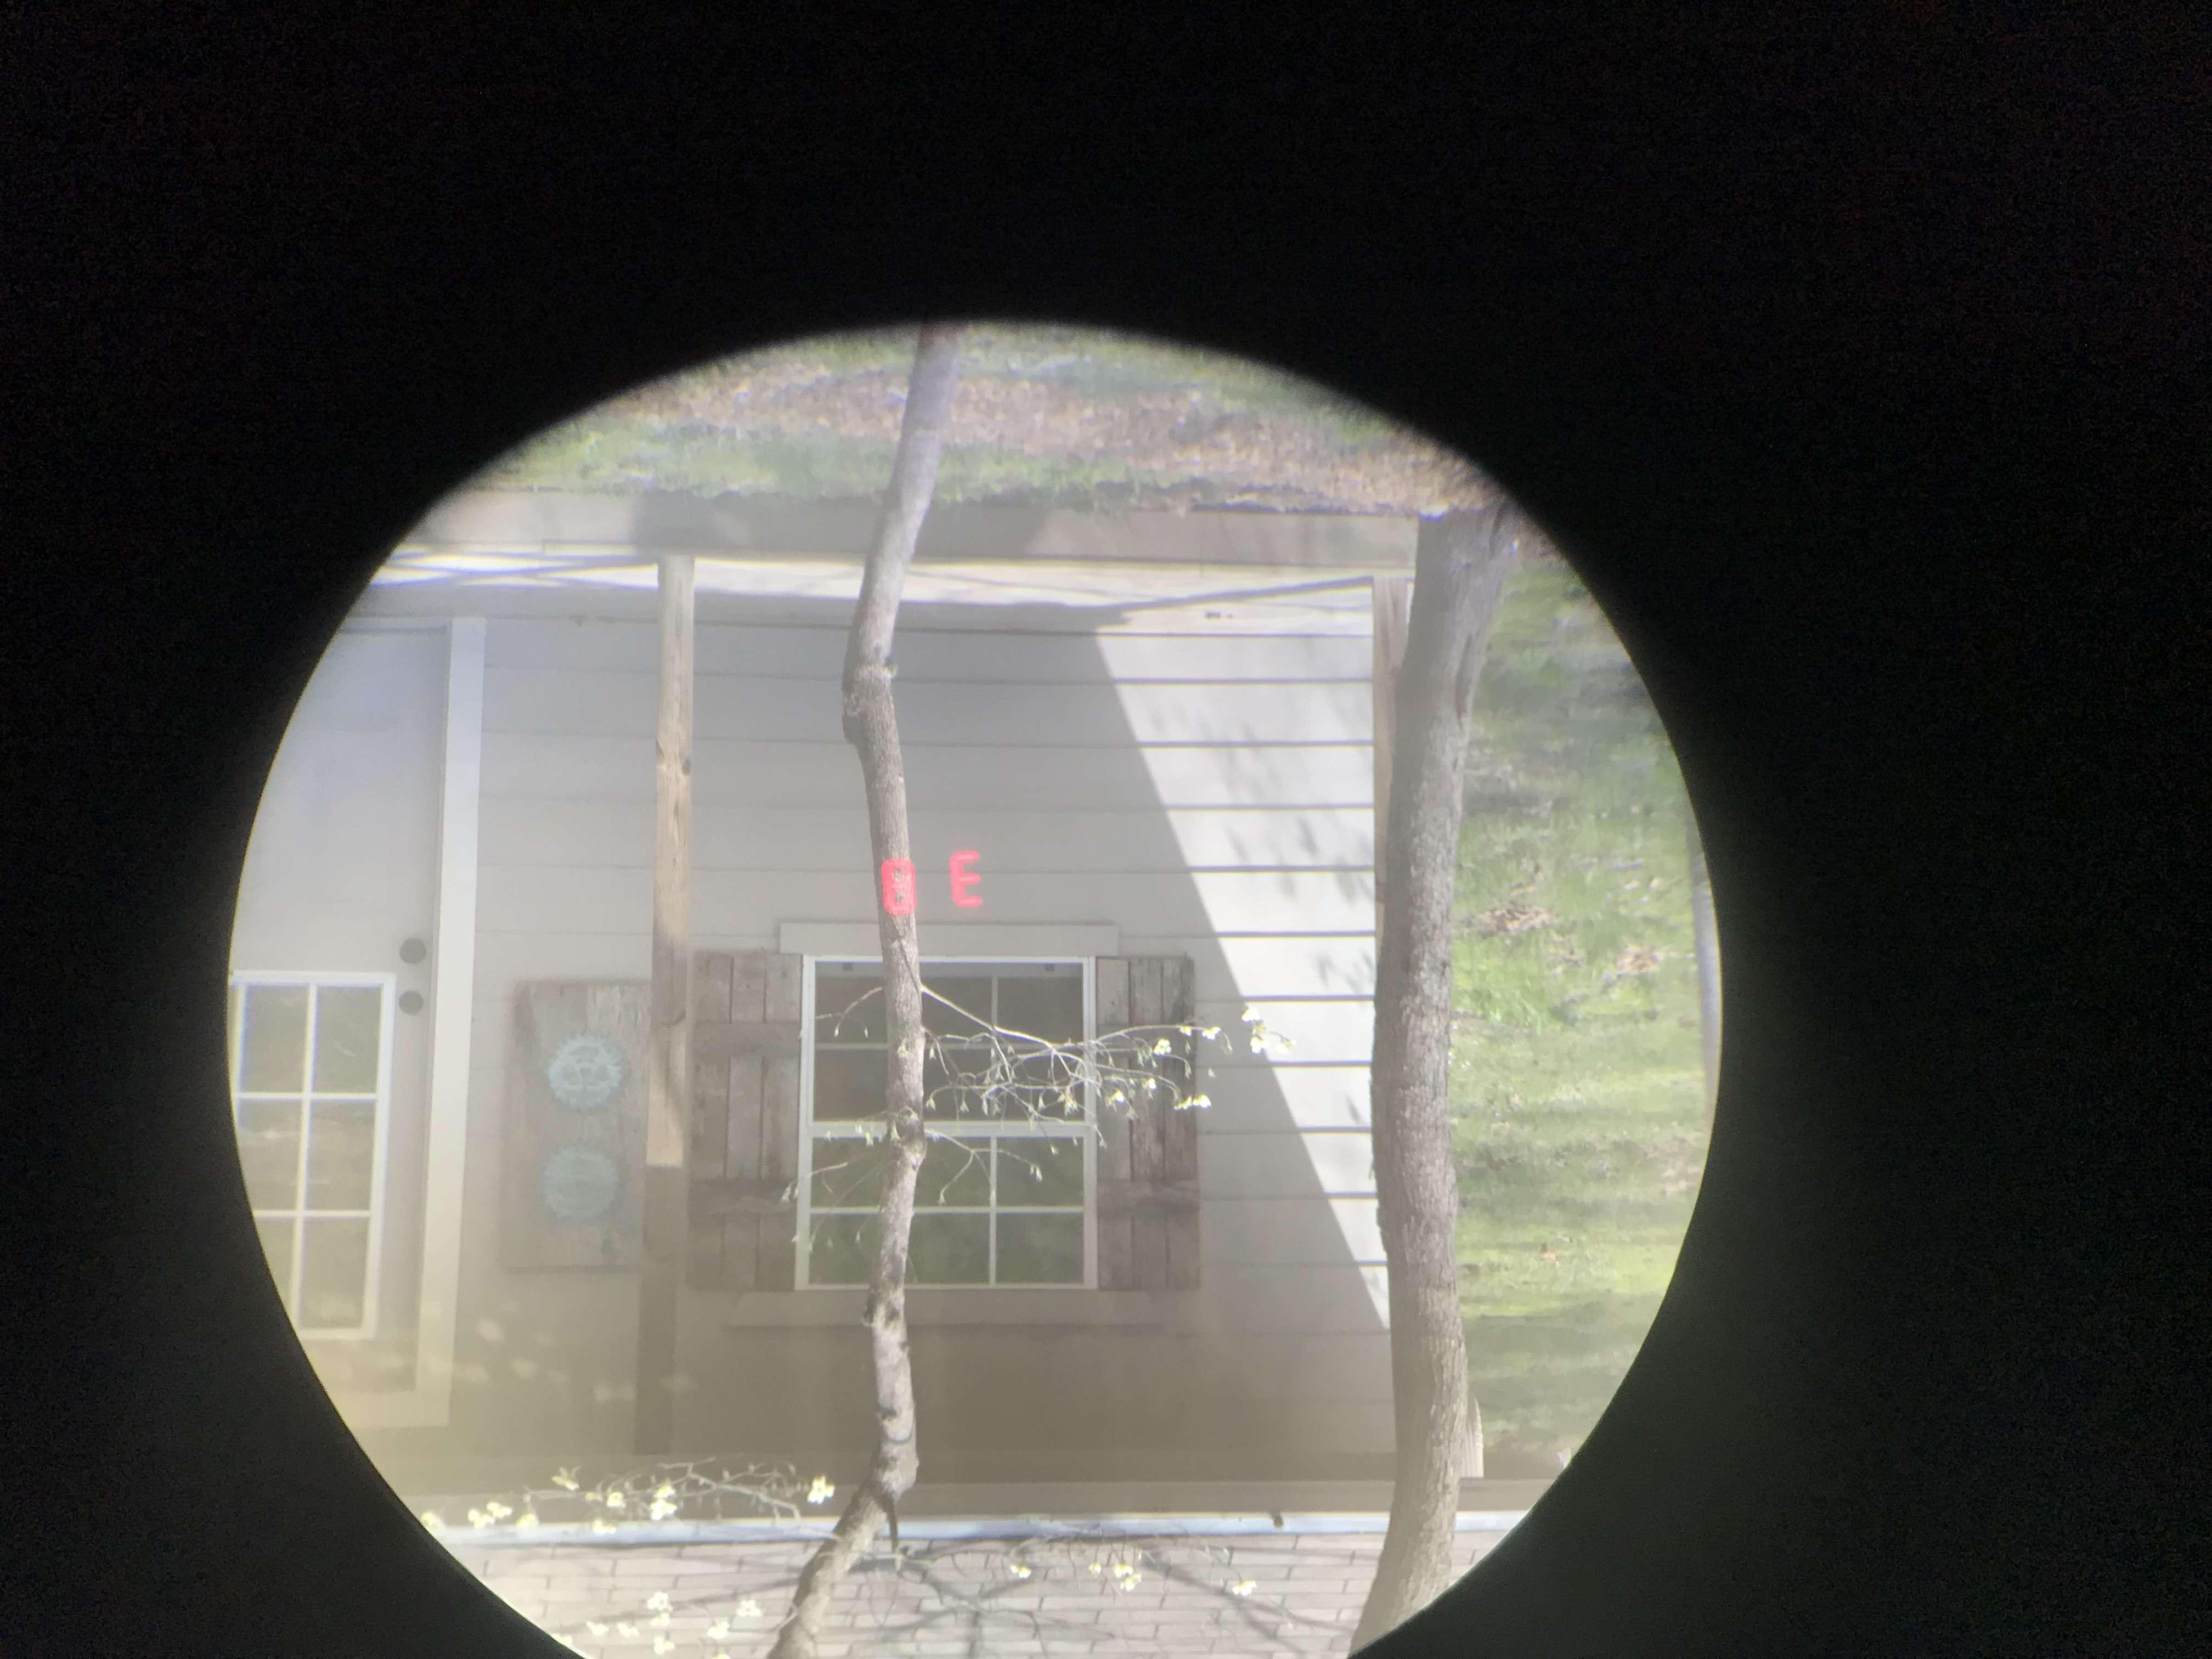 Leica entfernungsmesser lrf: leica rangemaster entfernungsmesser